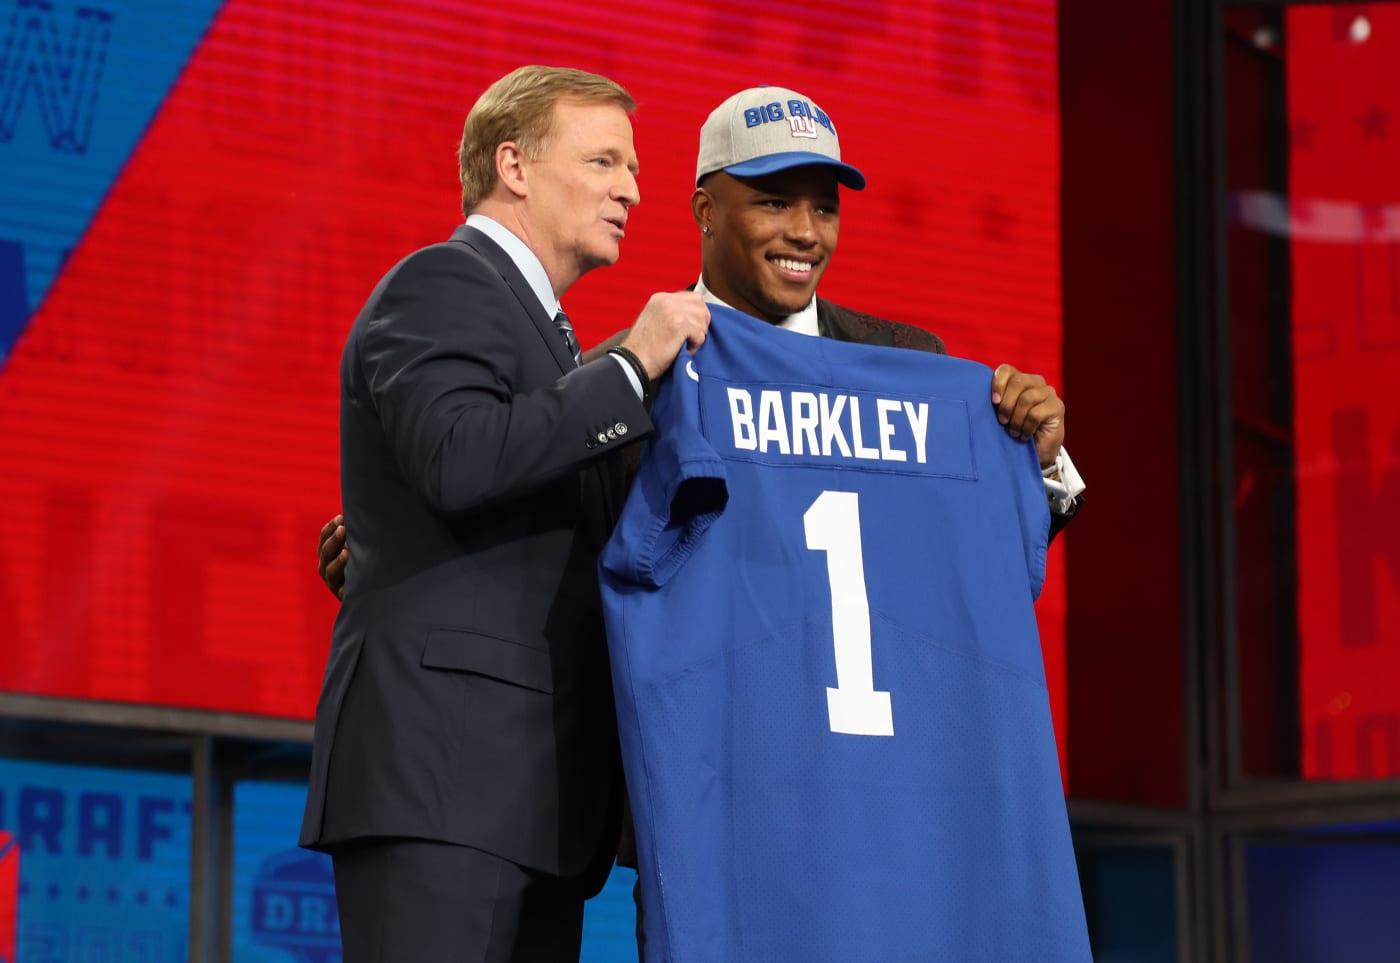 Saquon Barkley Roger Goodell NFL Draft 2018